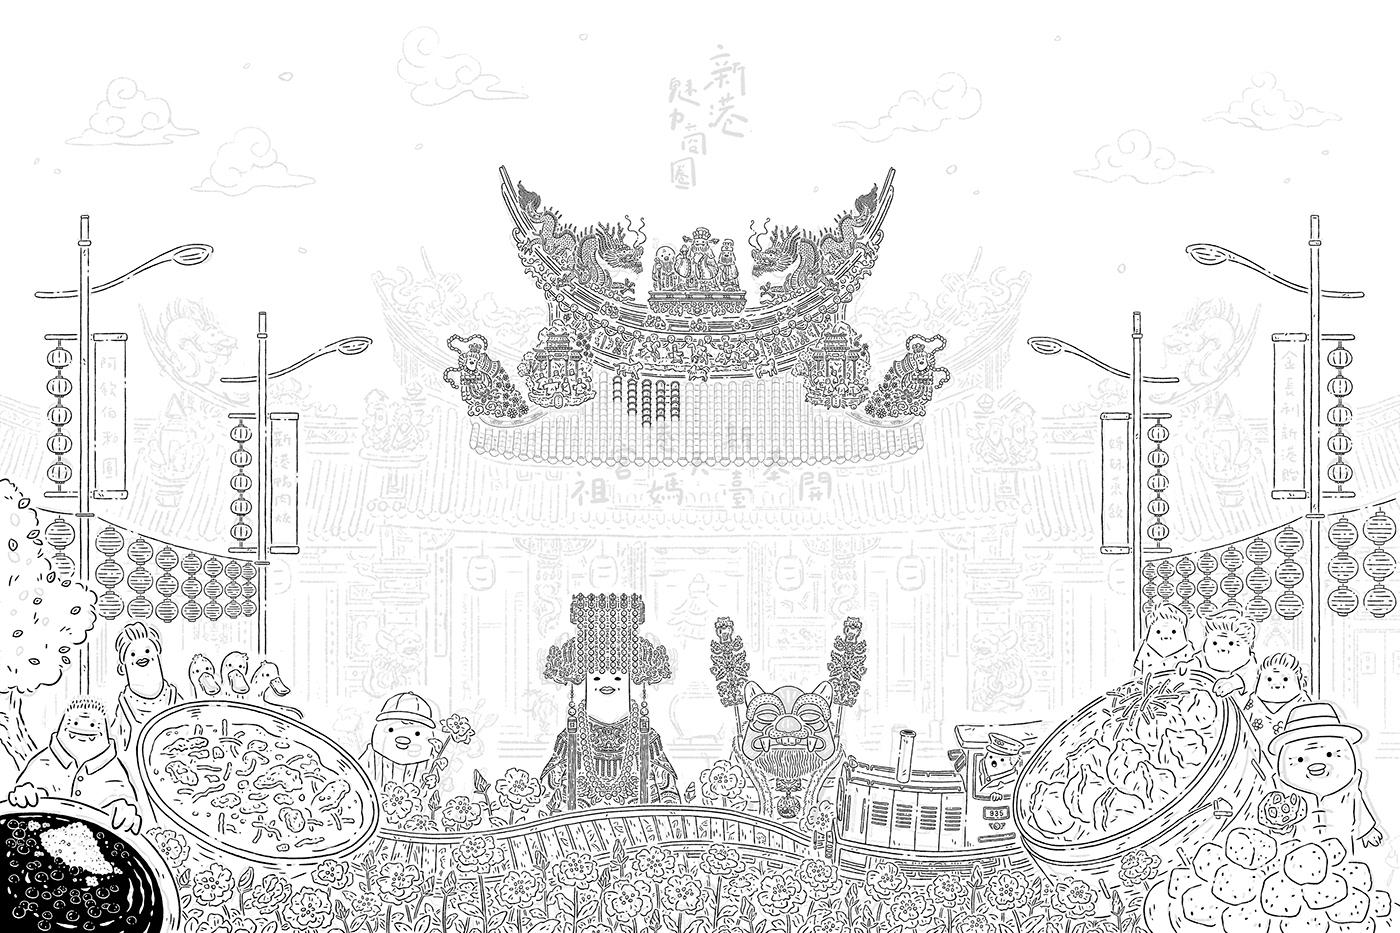 ILLUSTRATION  popoland 奉天宮 媽祖 插畫 插畫設計 新港 新港魅力商圈 波寶島 虎爺